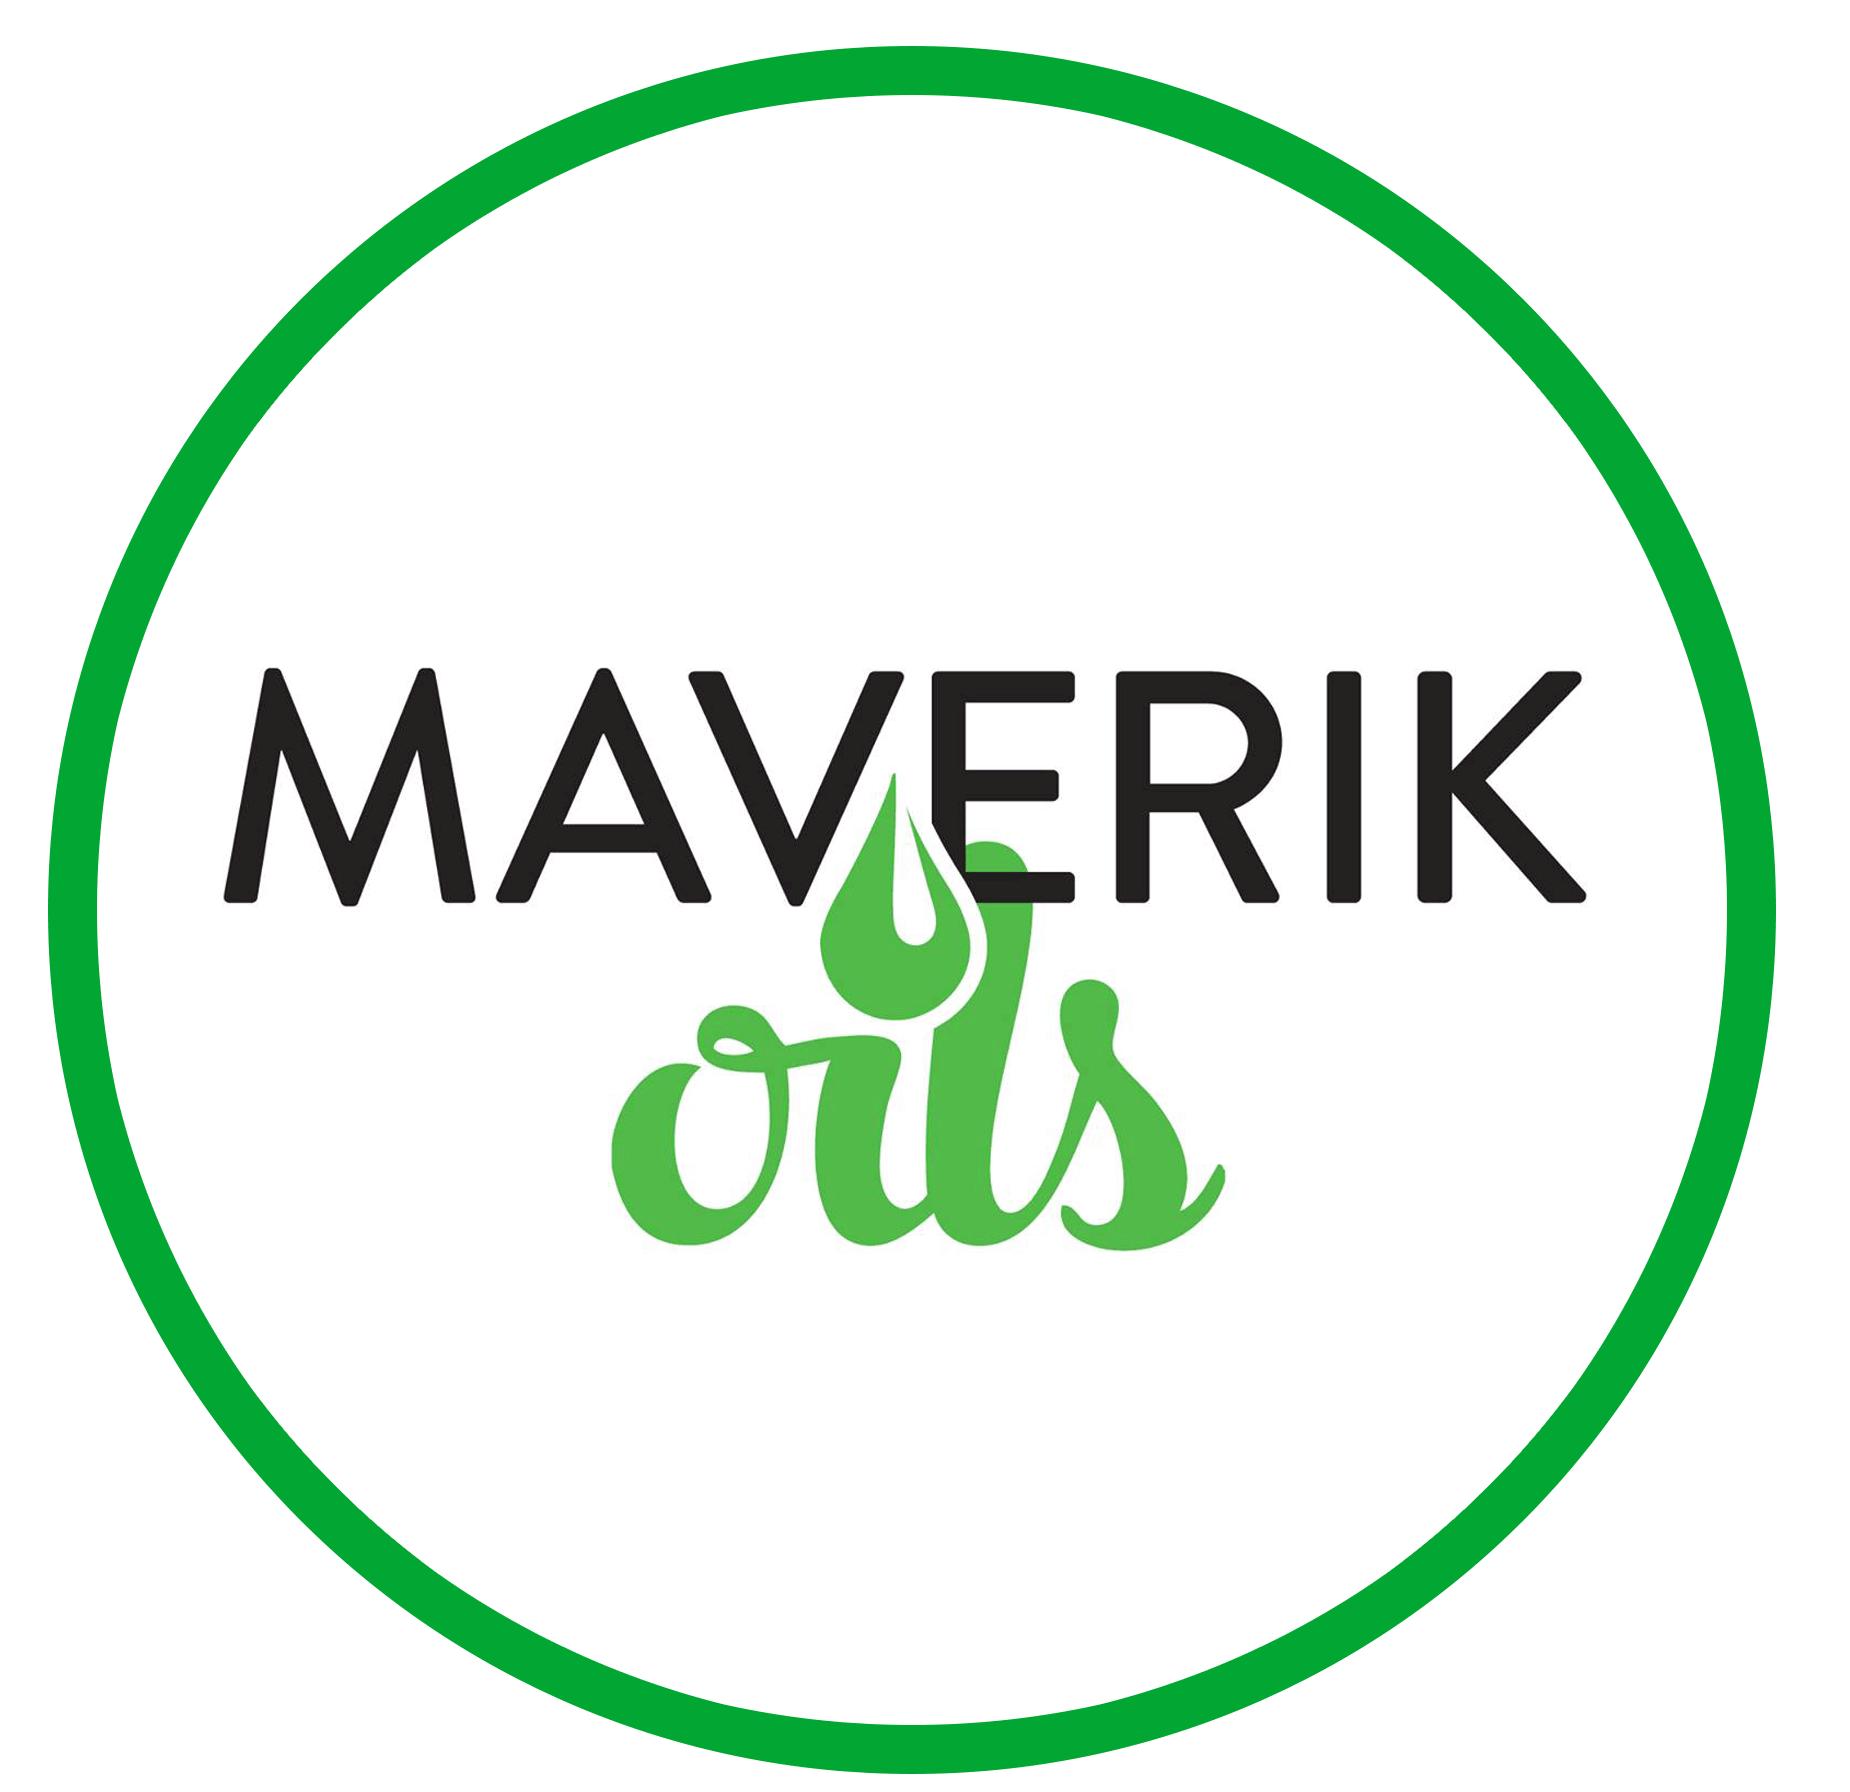 Maverik Oils logo Circle